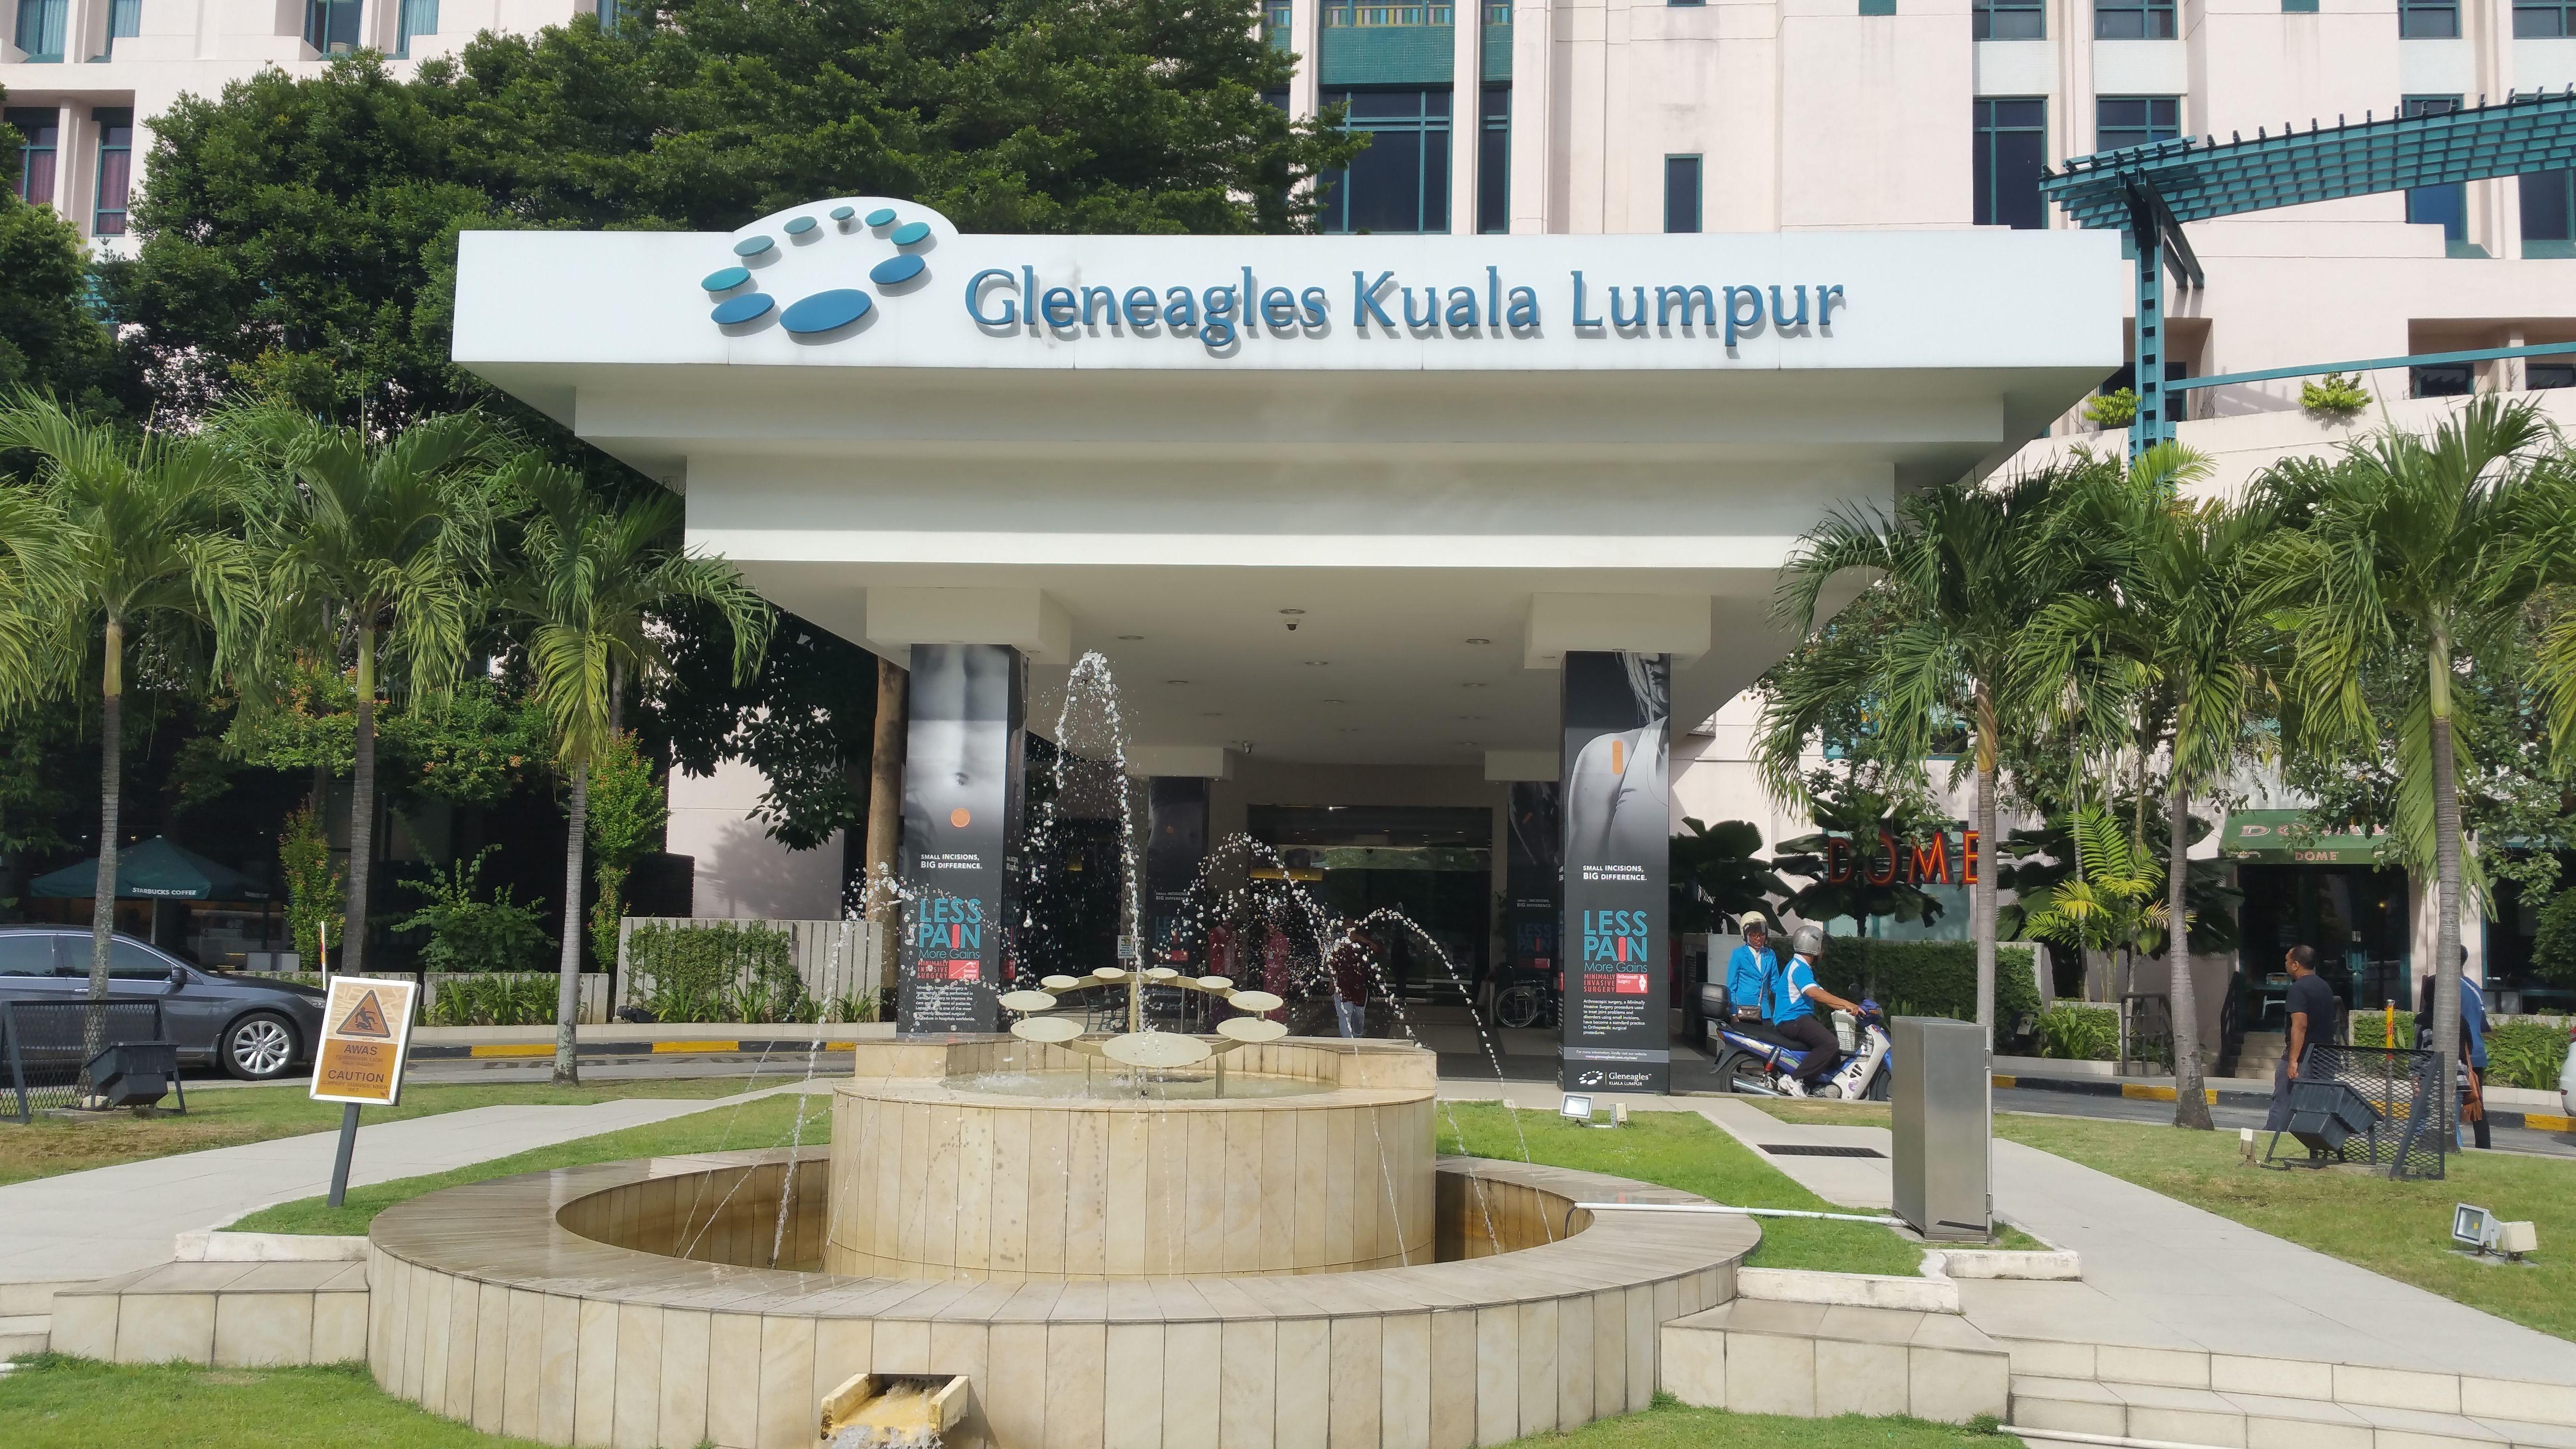 Gleneagles Hospital - Kuala Lumpur